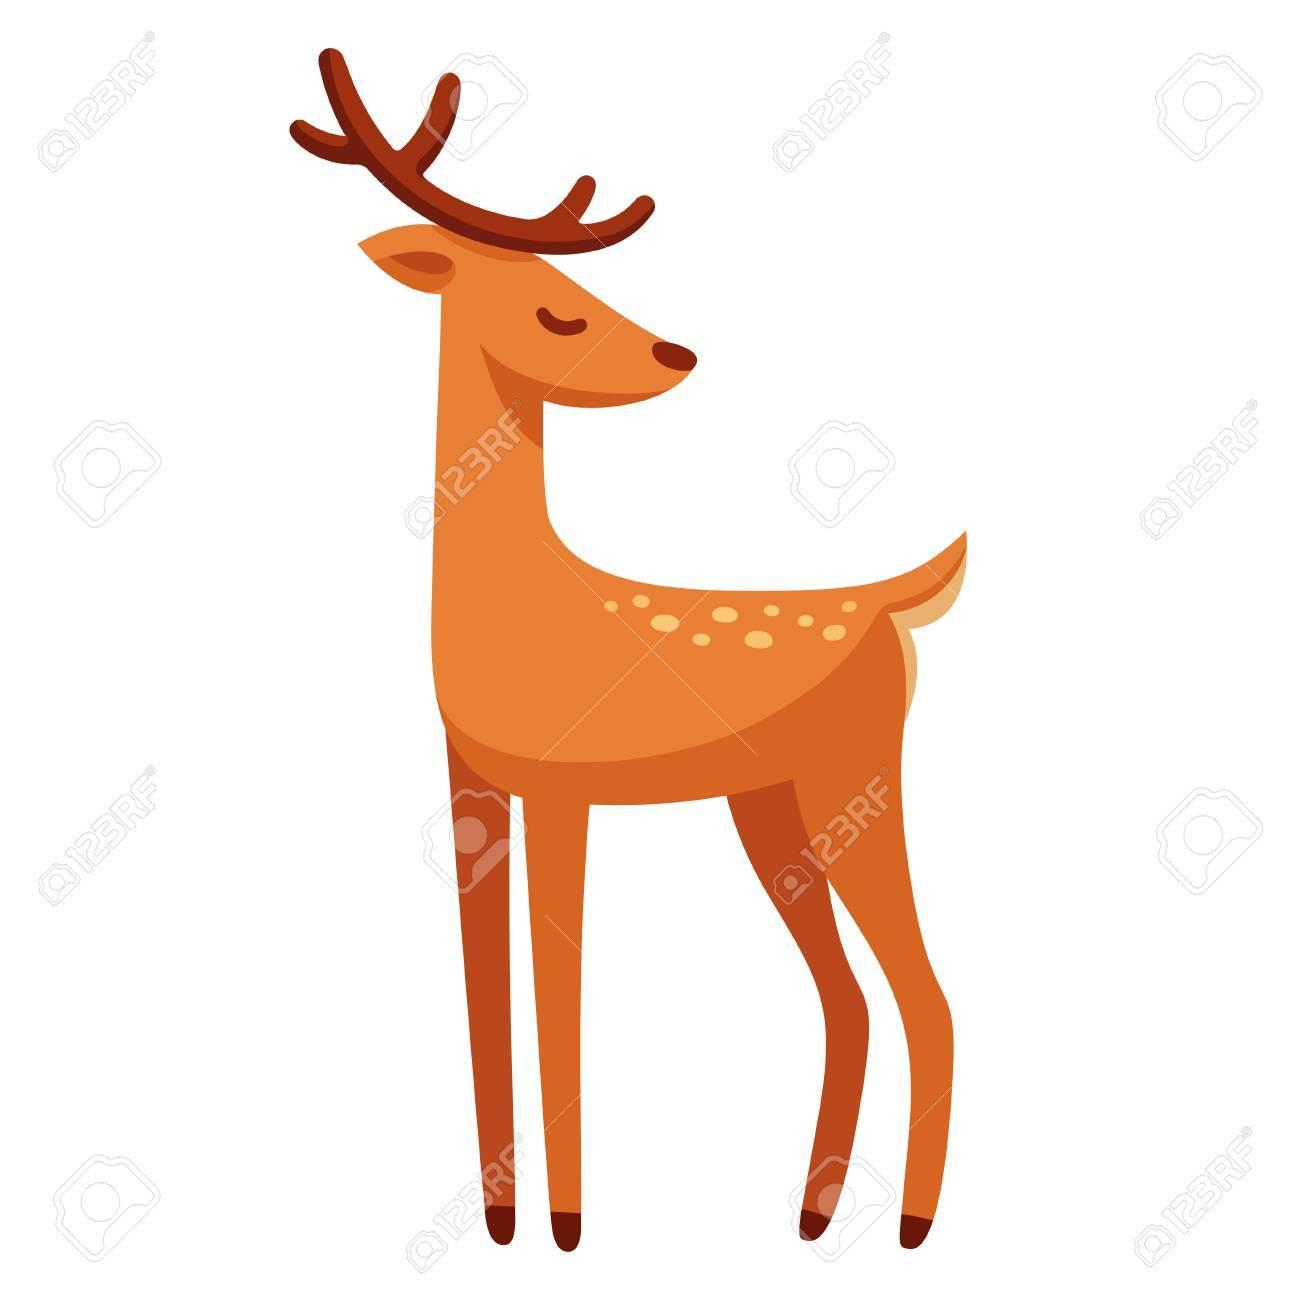 1300x1300 Cartoon Male Deer Drawing Royalty Free Cliparts, Vectors,